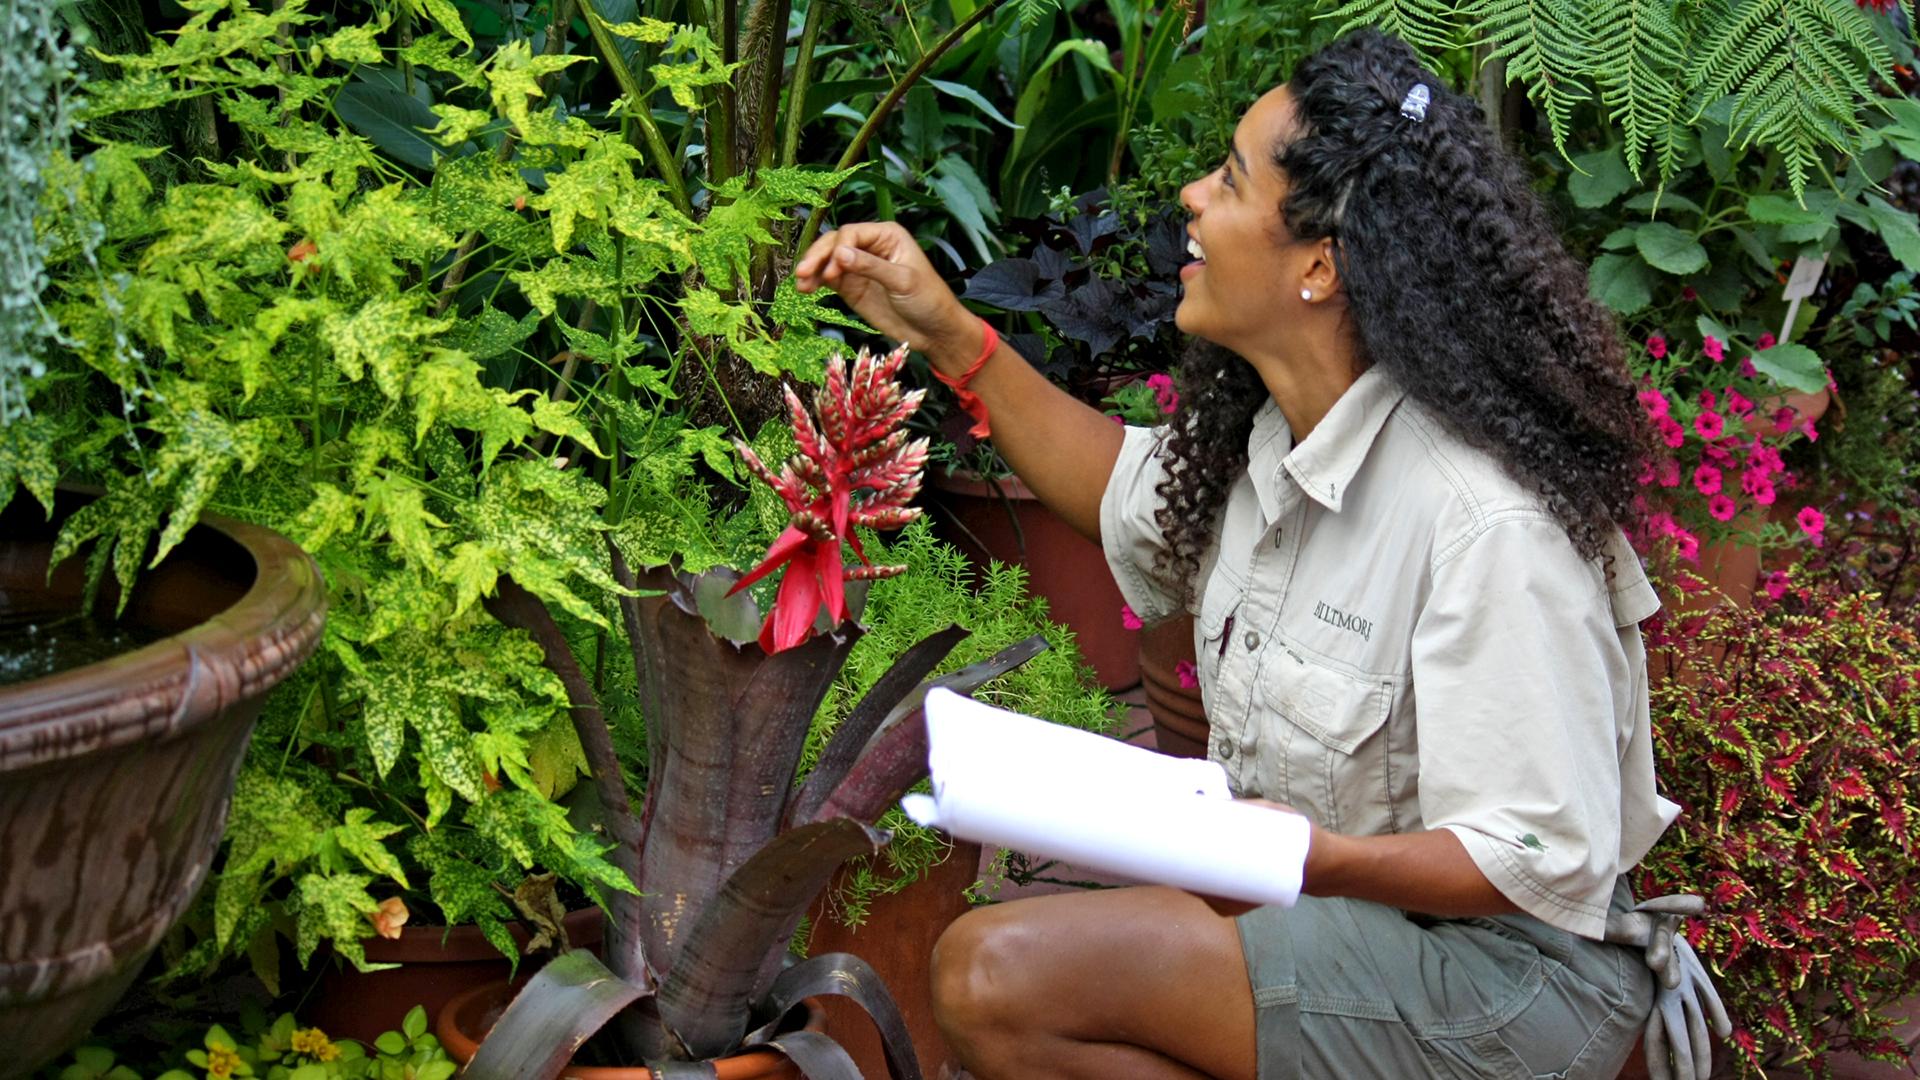 Biltmore-Estate-Ashville-North-Carolina-Internship-Landscape-Horticulture-Major-Degree-Student-Molly-Dutton-Beautiful-Flowers-Green-Leaves-Plants-5799